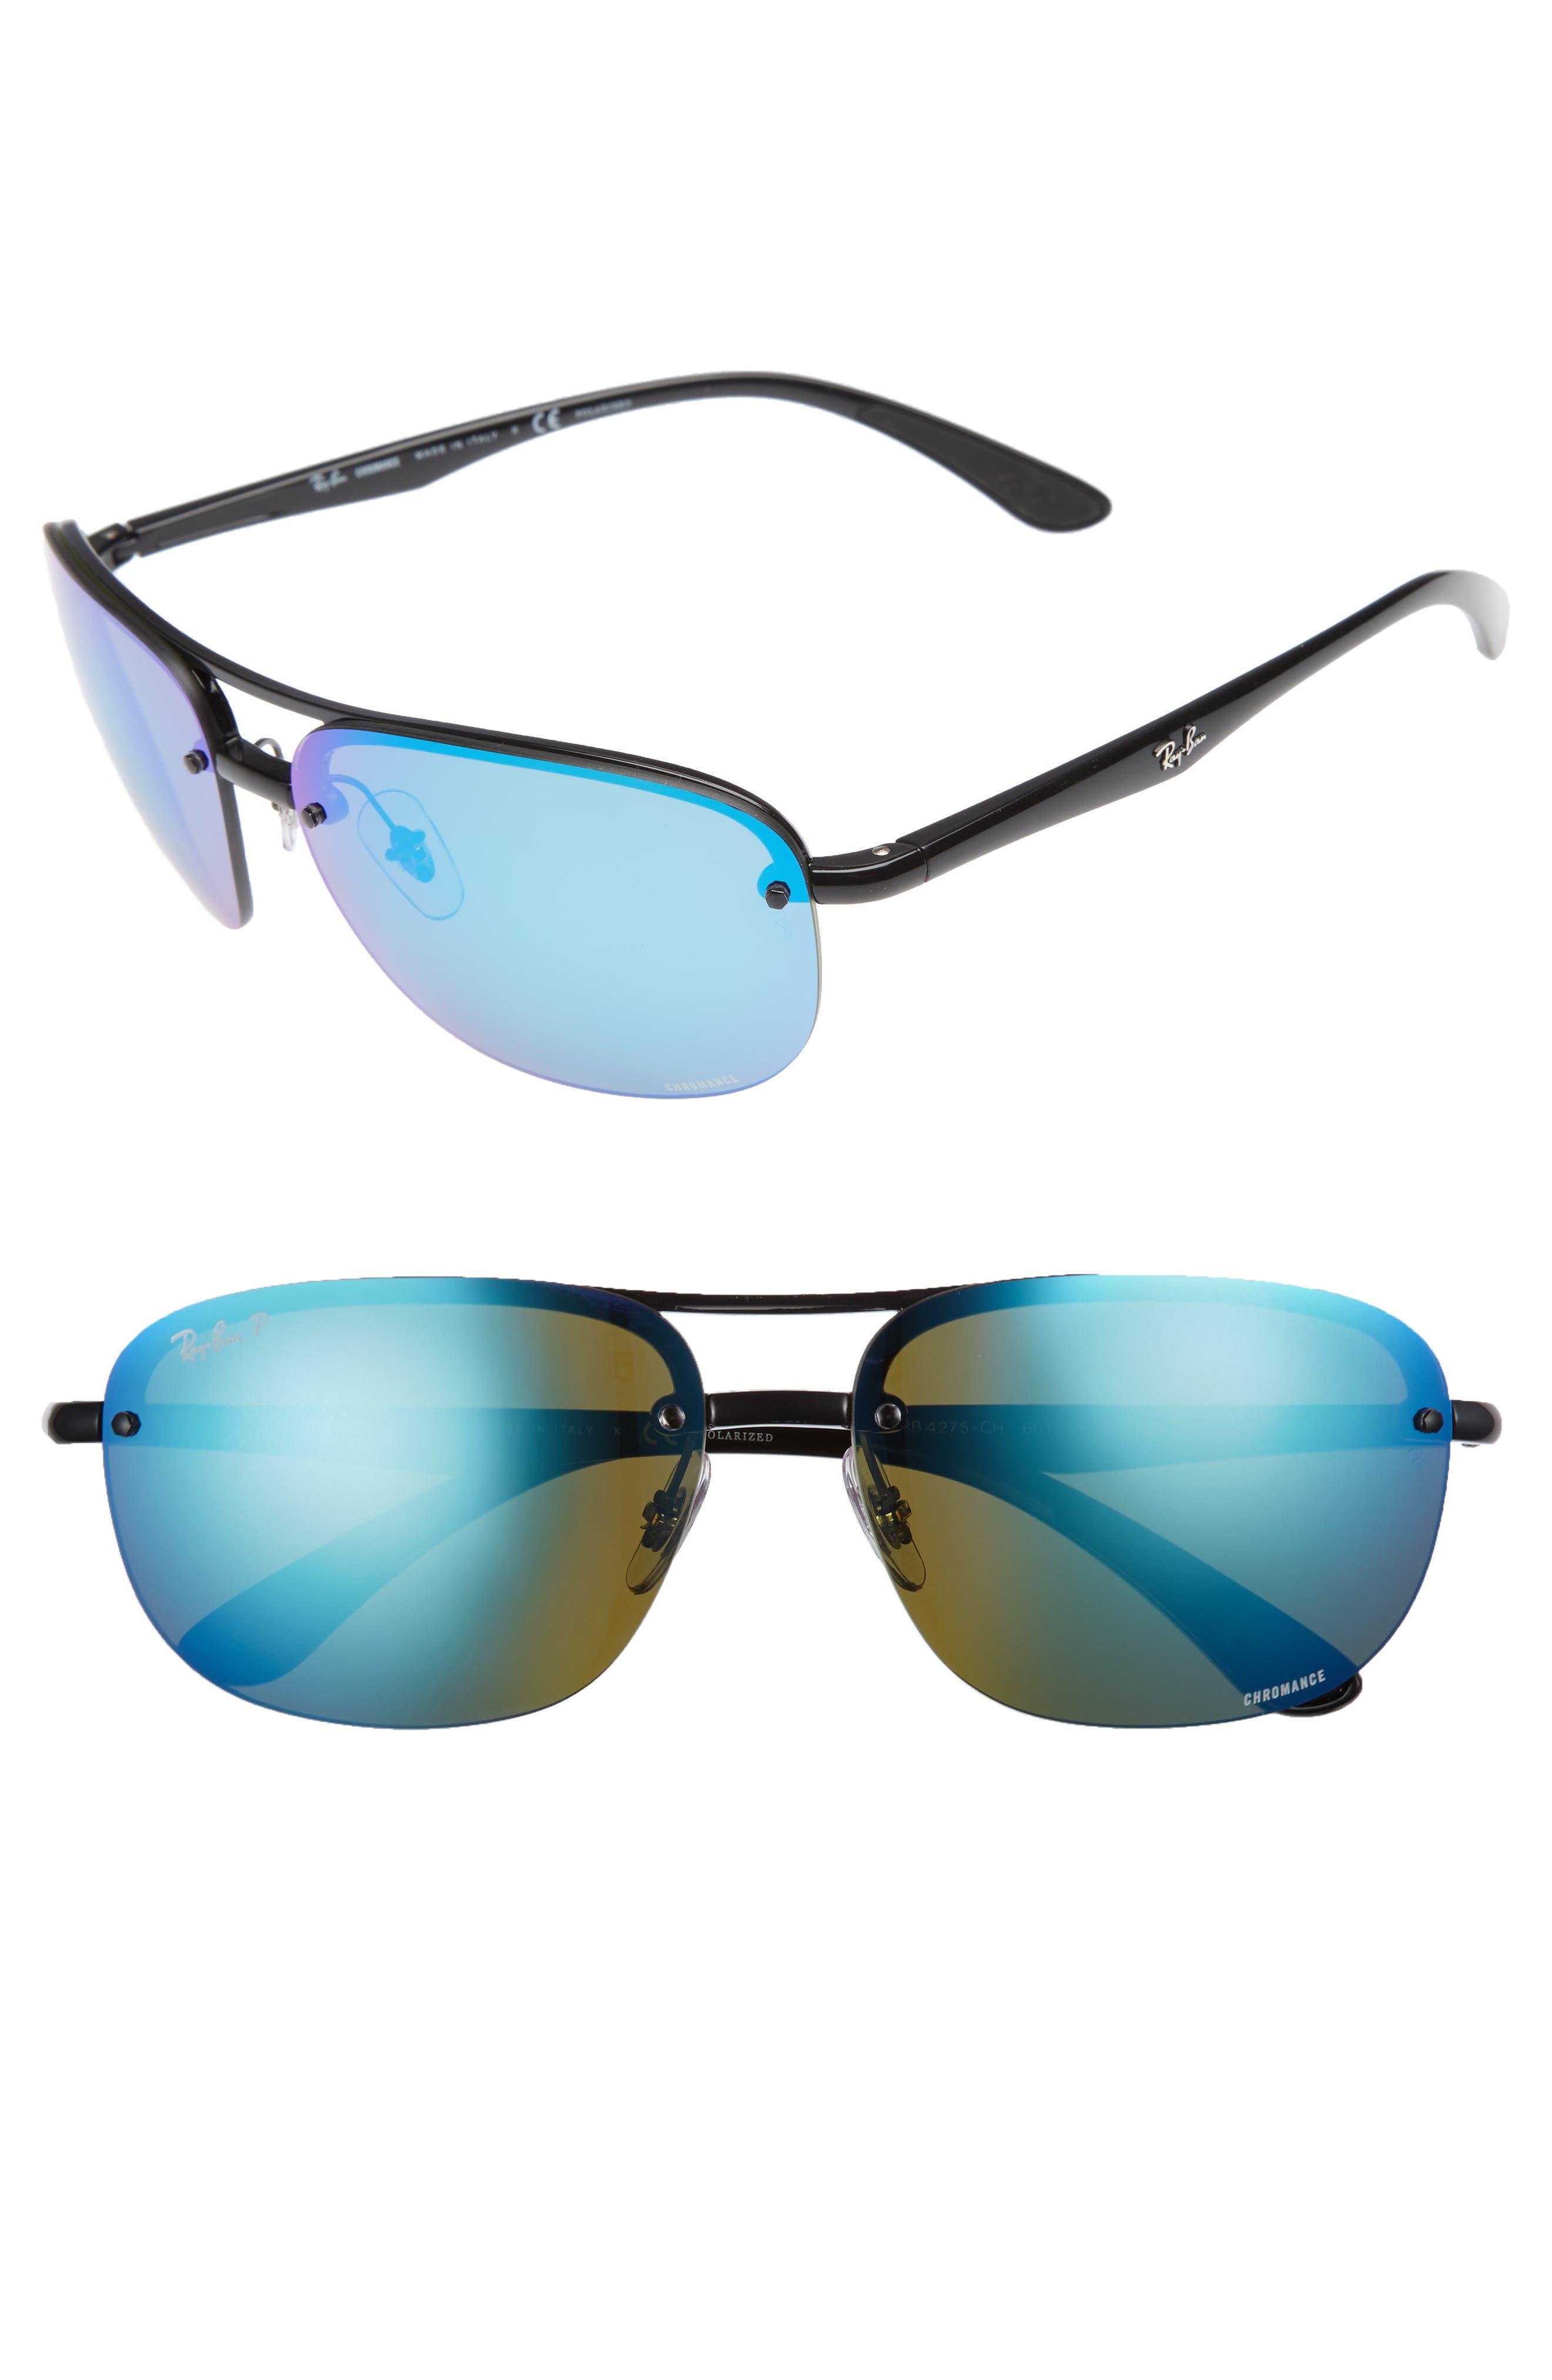 Ray-Ban Chromance 63mm Polarized Square Sunglasses